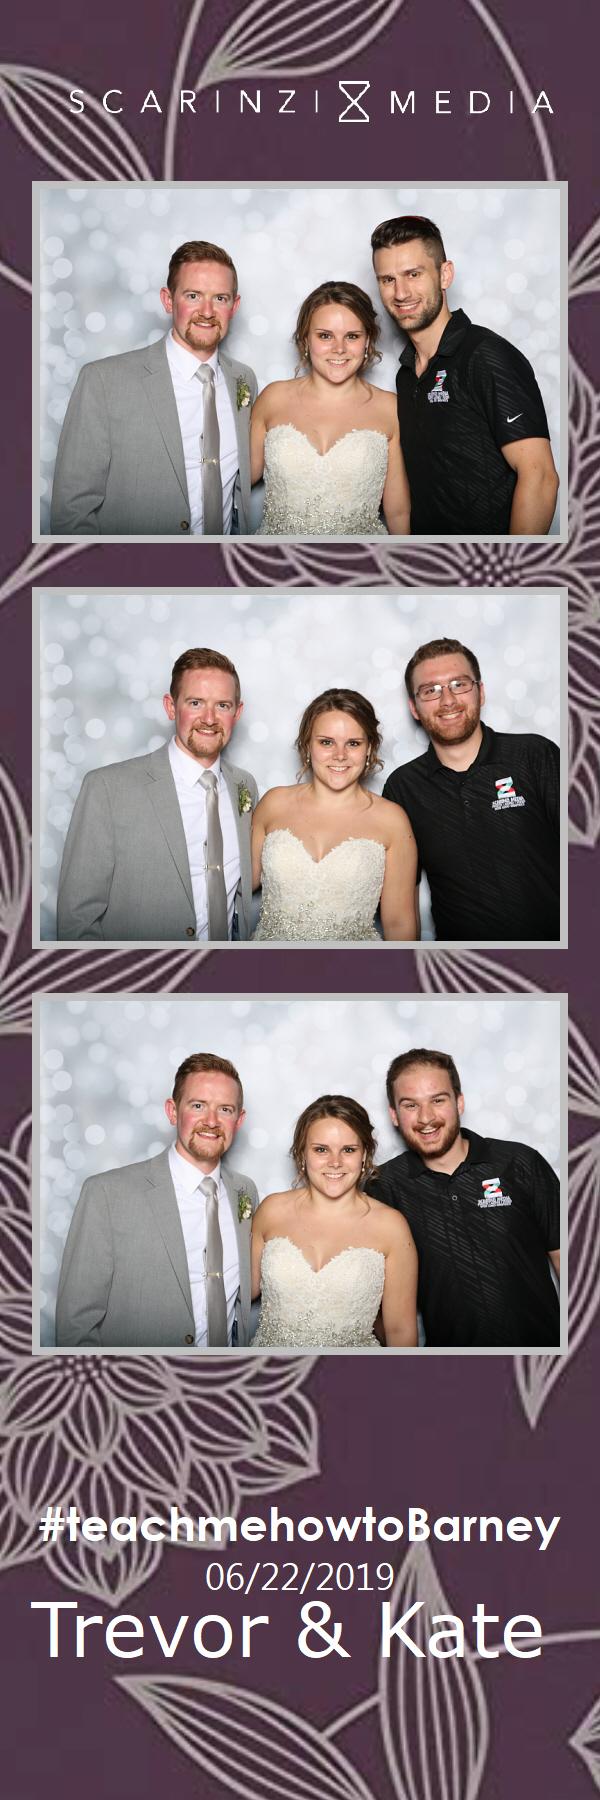 2019.06.22 - Barney Wedding PHOTOBOOTH73.jpg